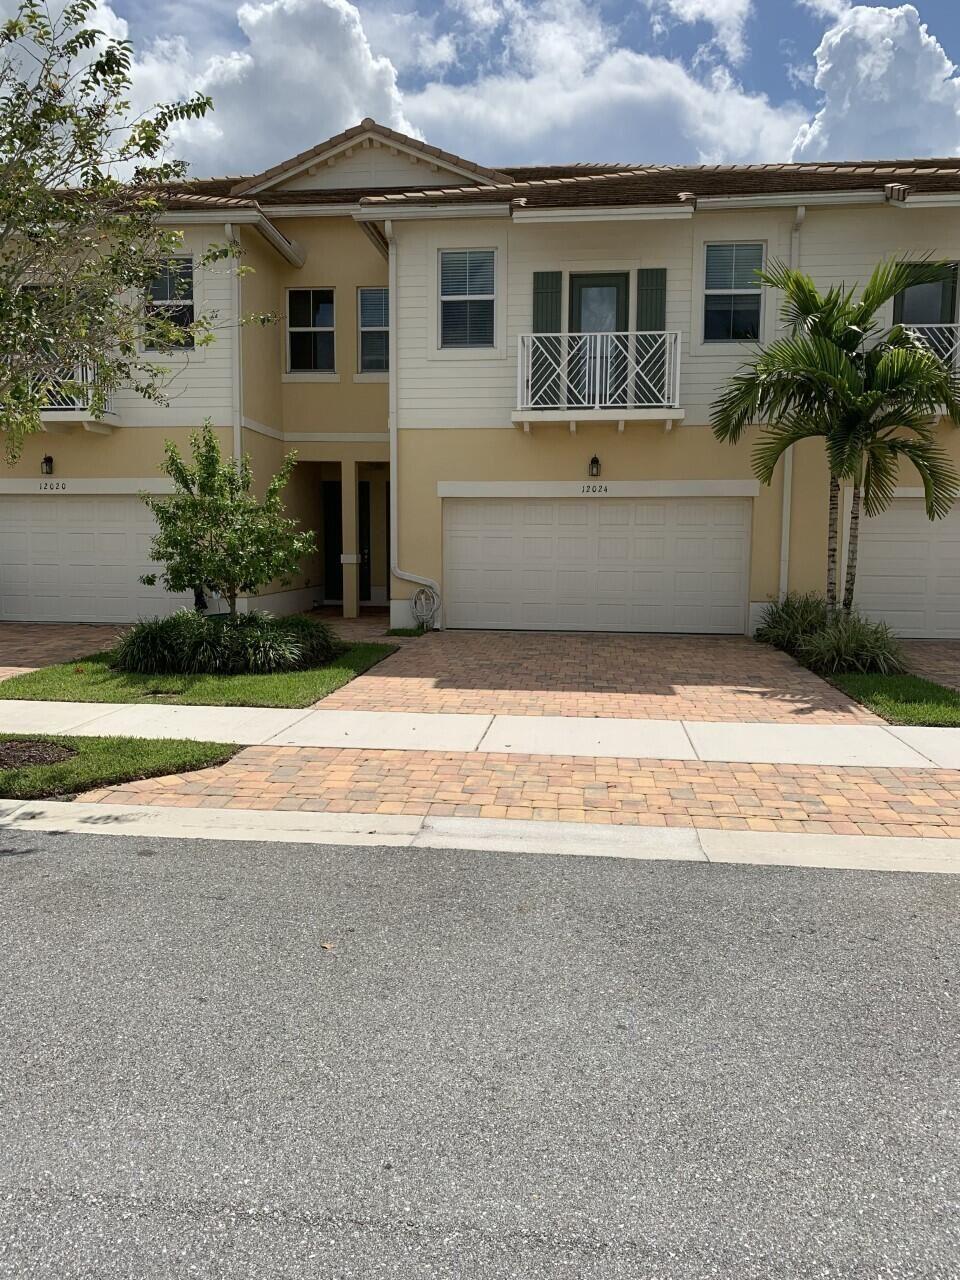 12024 Cypress Key Way, Royal Palm Beach, FL 33411 - MLS#: RX-10751363